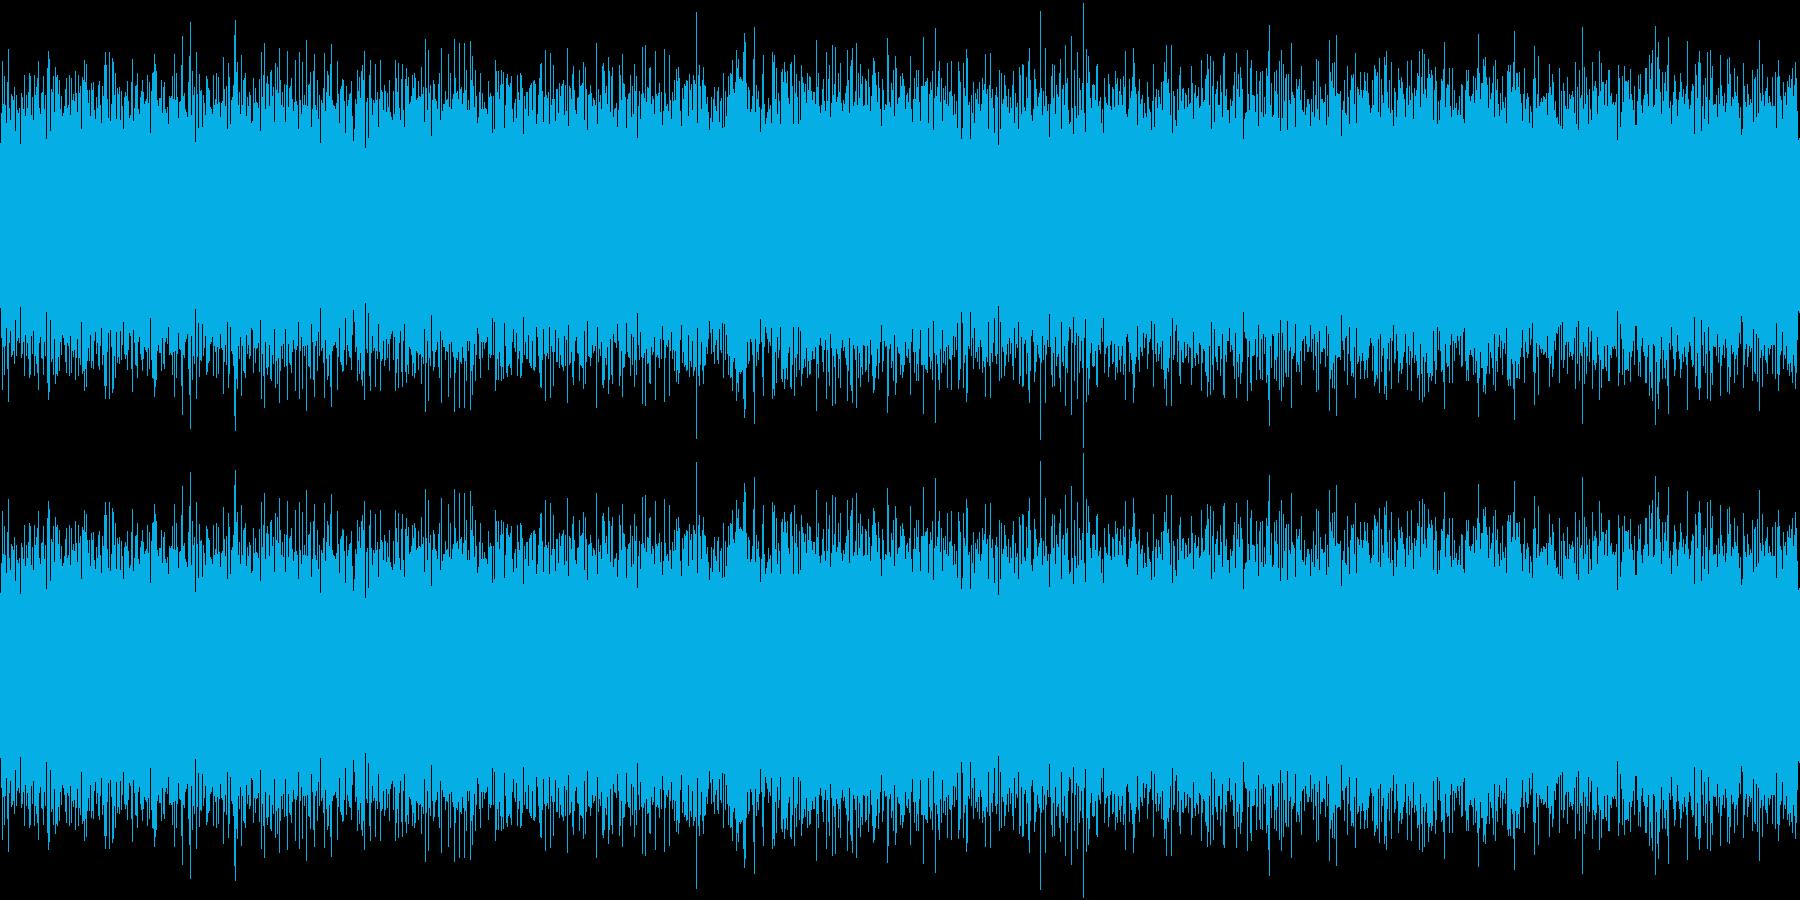 SunaArashi TVの砂嵐 2の再生済みの波形